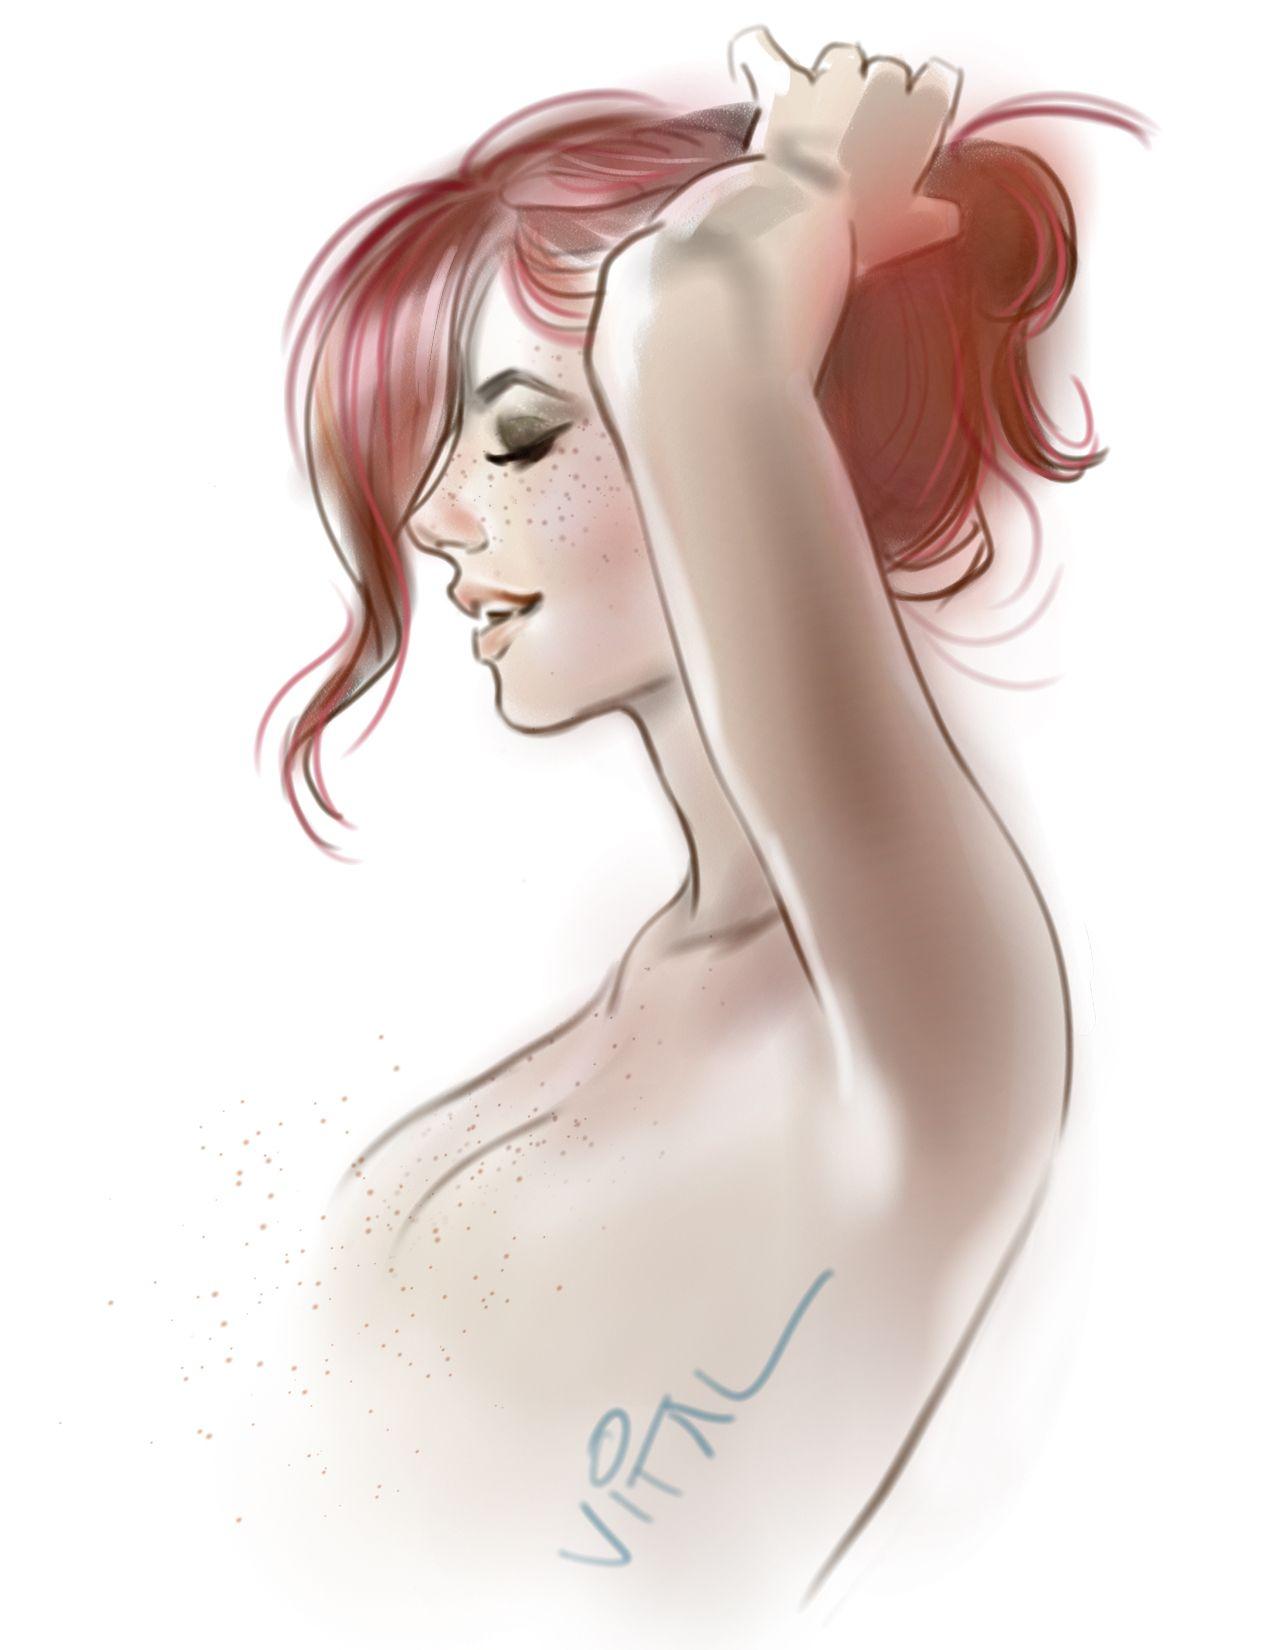 Cheryl tweedy hard nipples pics